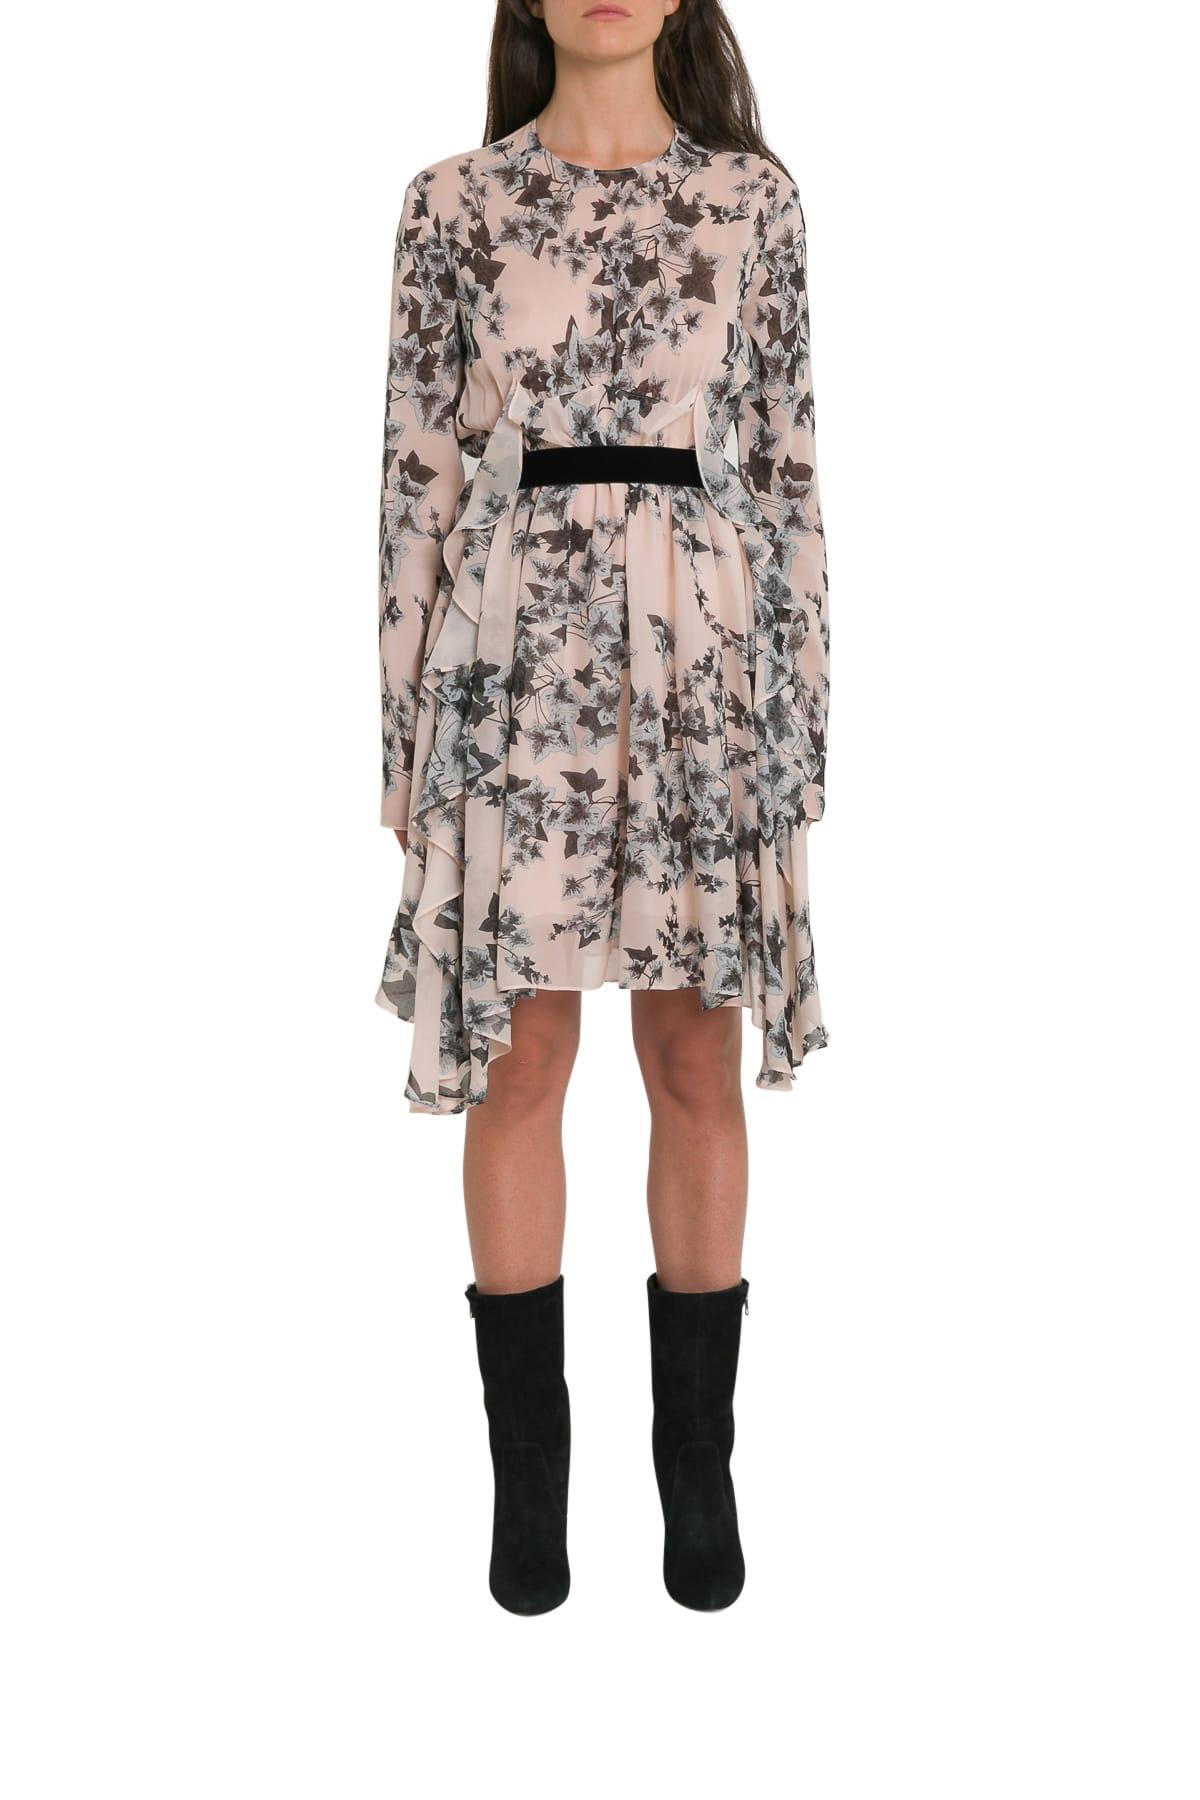 Philosophy di Lorenzo Serafini Floral Print Silk Dress